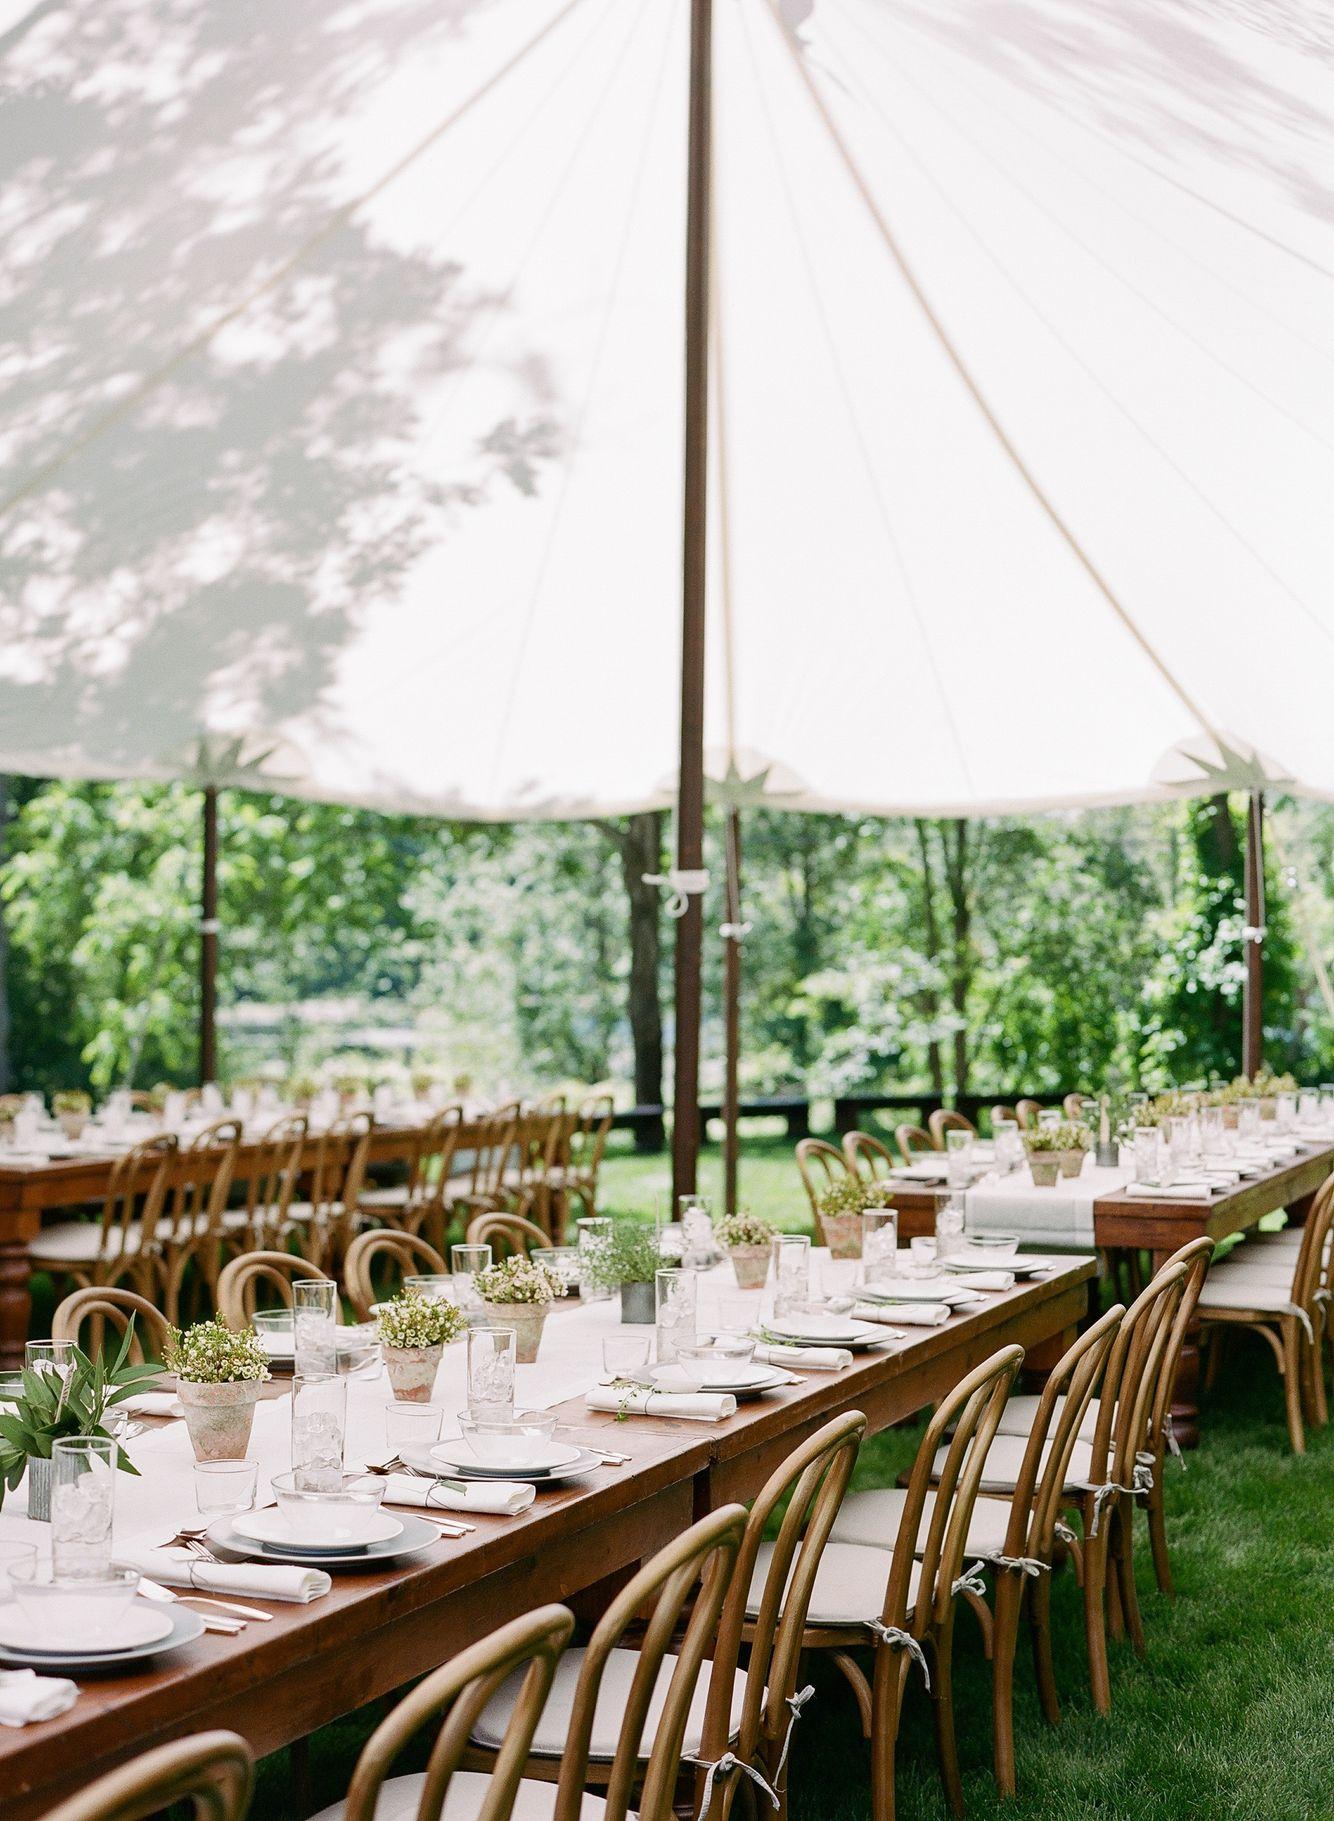 KarenHillPhotography-Regas-Wedding-SP-0013.jpg